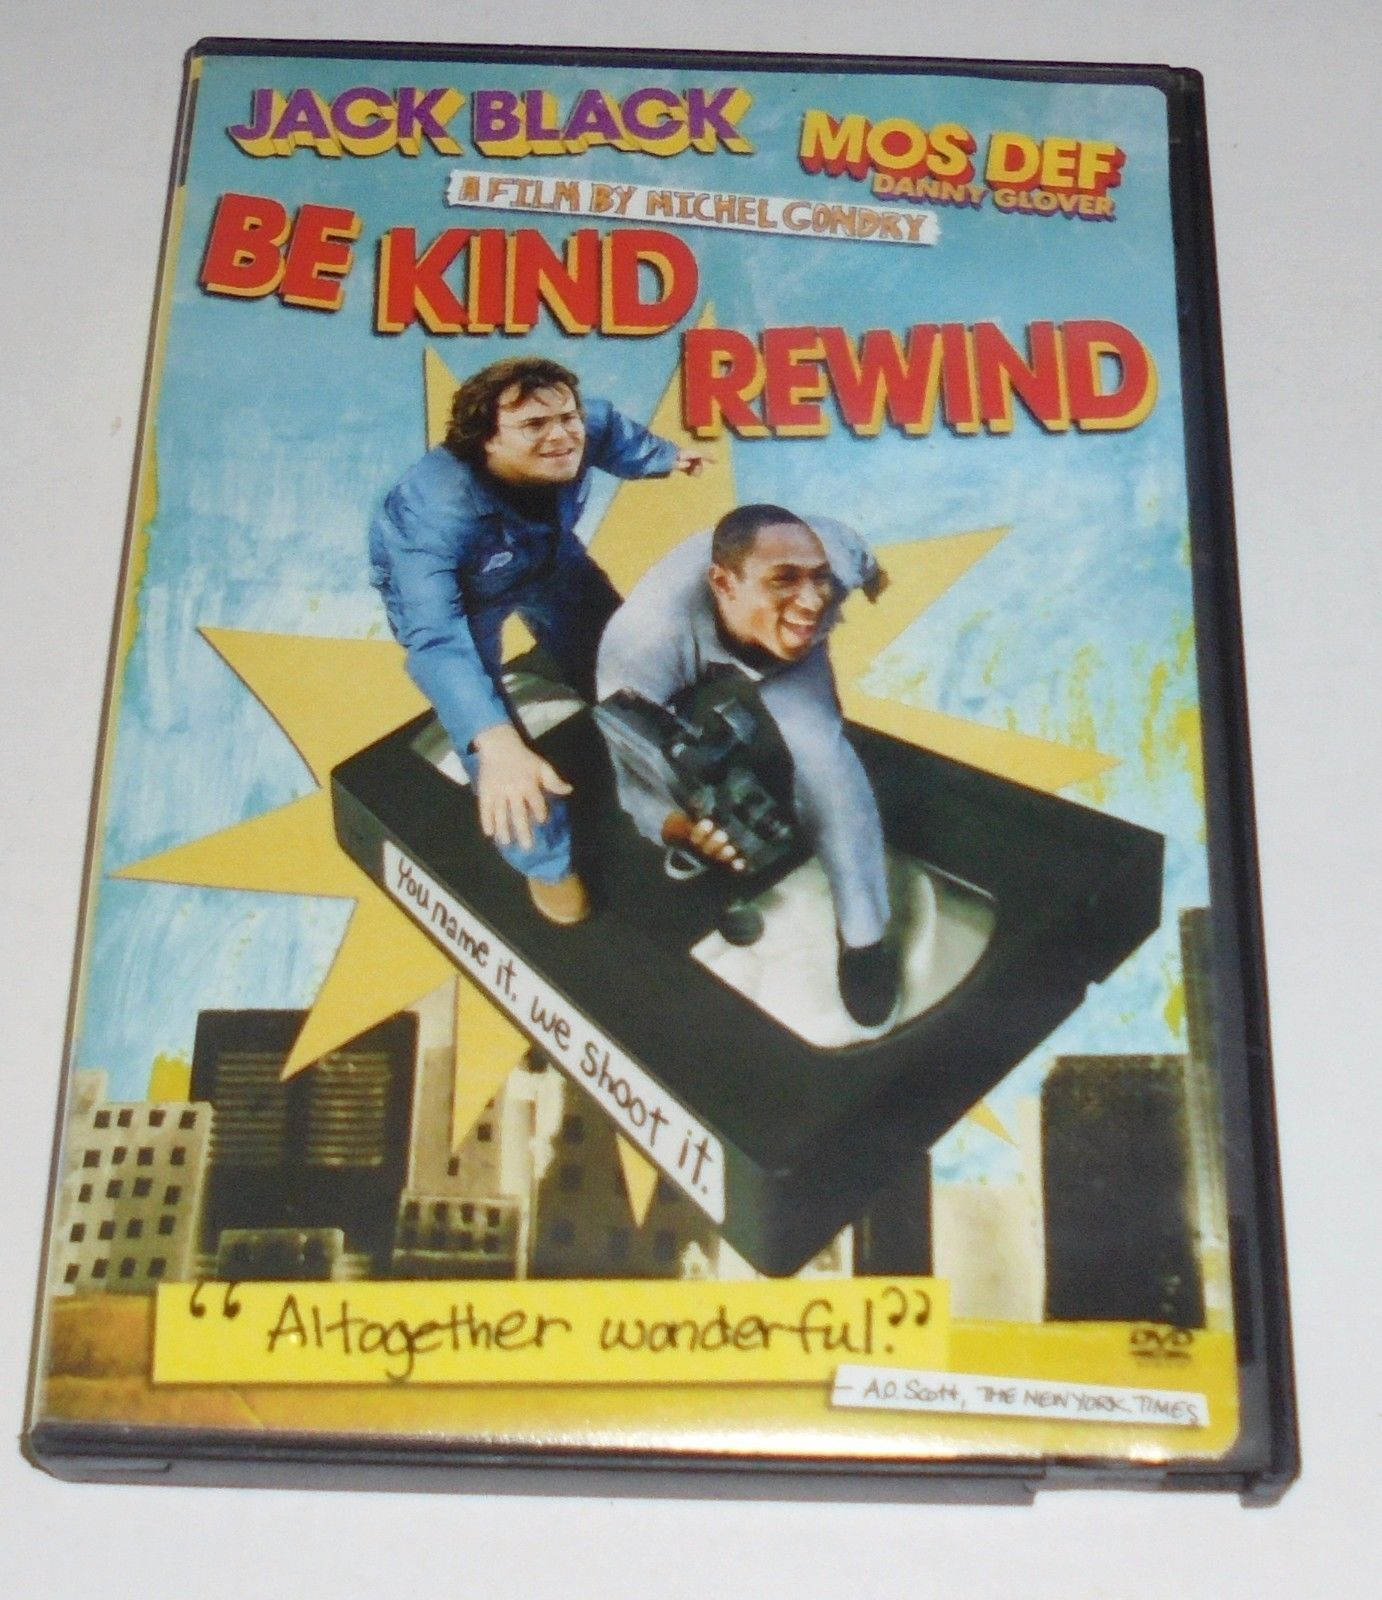 Be Kind Rewind (DVD, 2008) Jack Black, Mos Def Comedy Movie